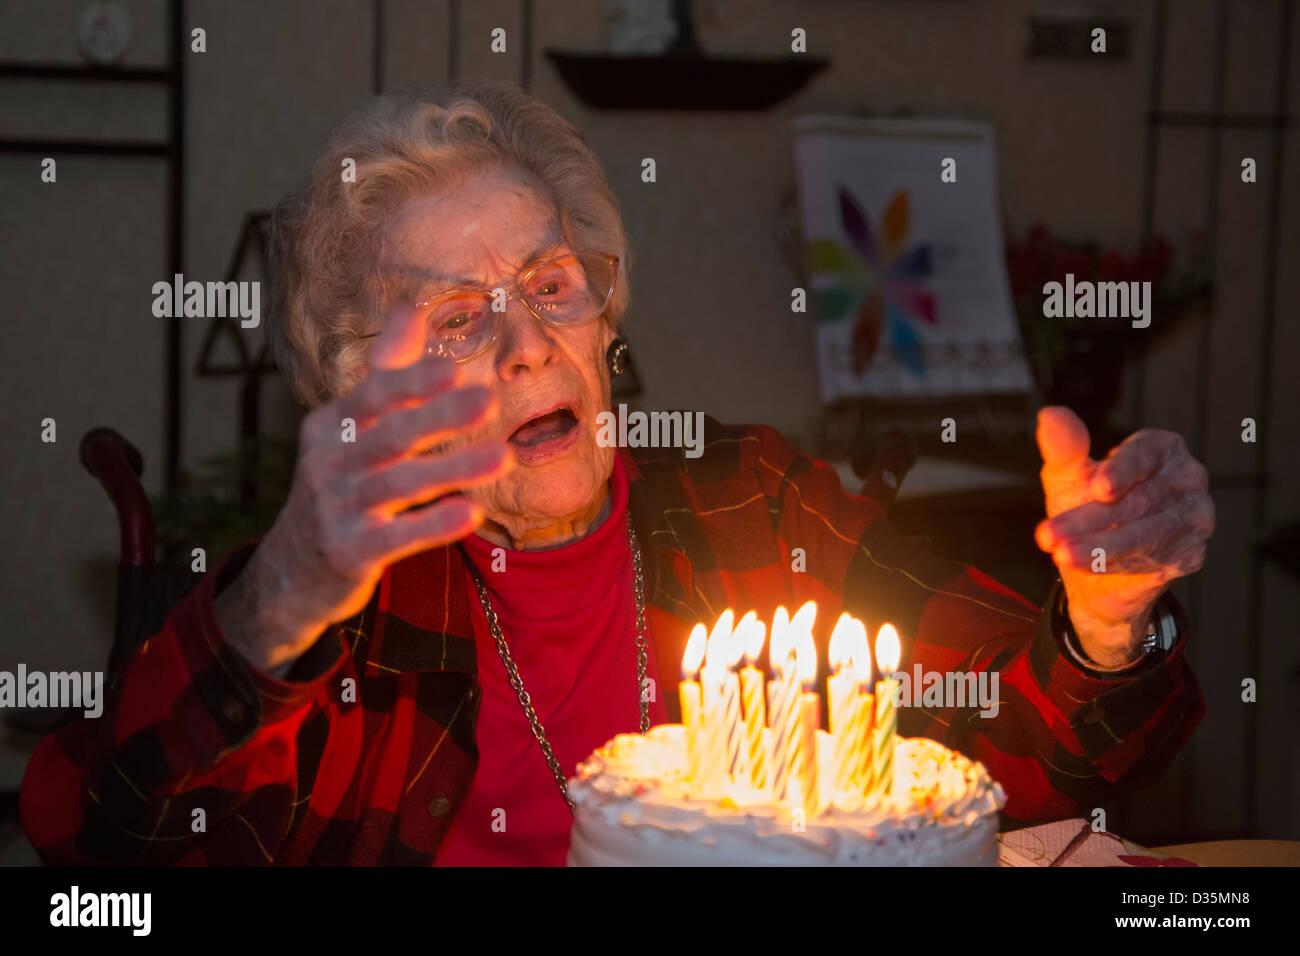 Sterling Heights, Michigan - Dorothy Newell celebra su 99º cumpleaños. Imagen De Stock